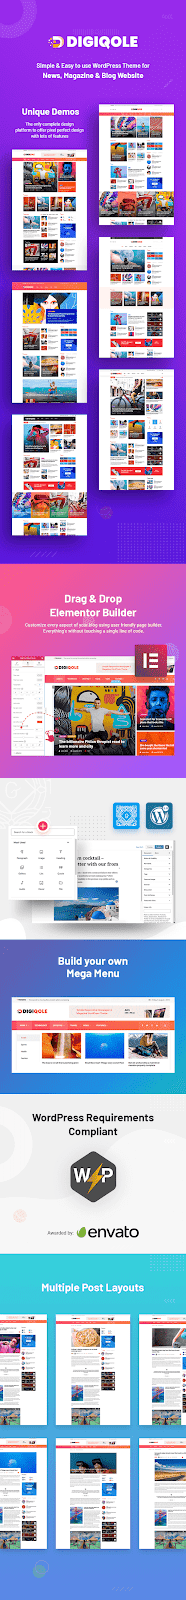 News Magazine WordPress Responsive Theme - Digiqole